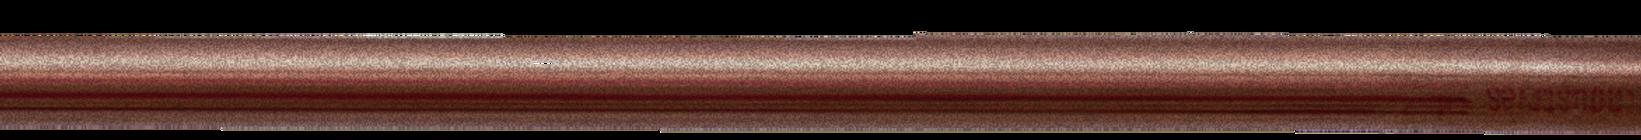 copper pipe_edited_edited_edited_edited_